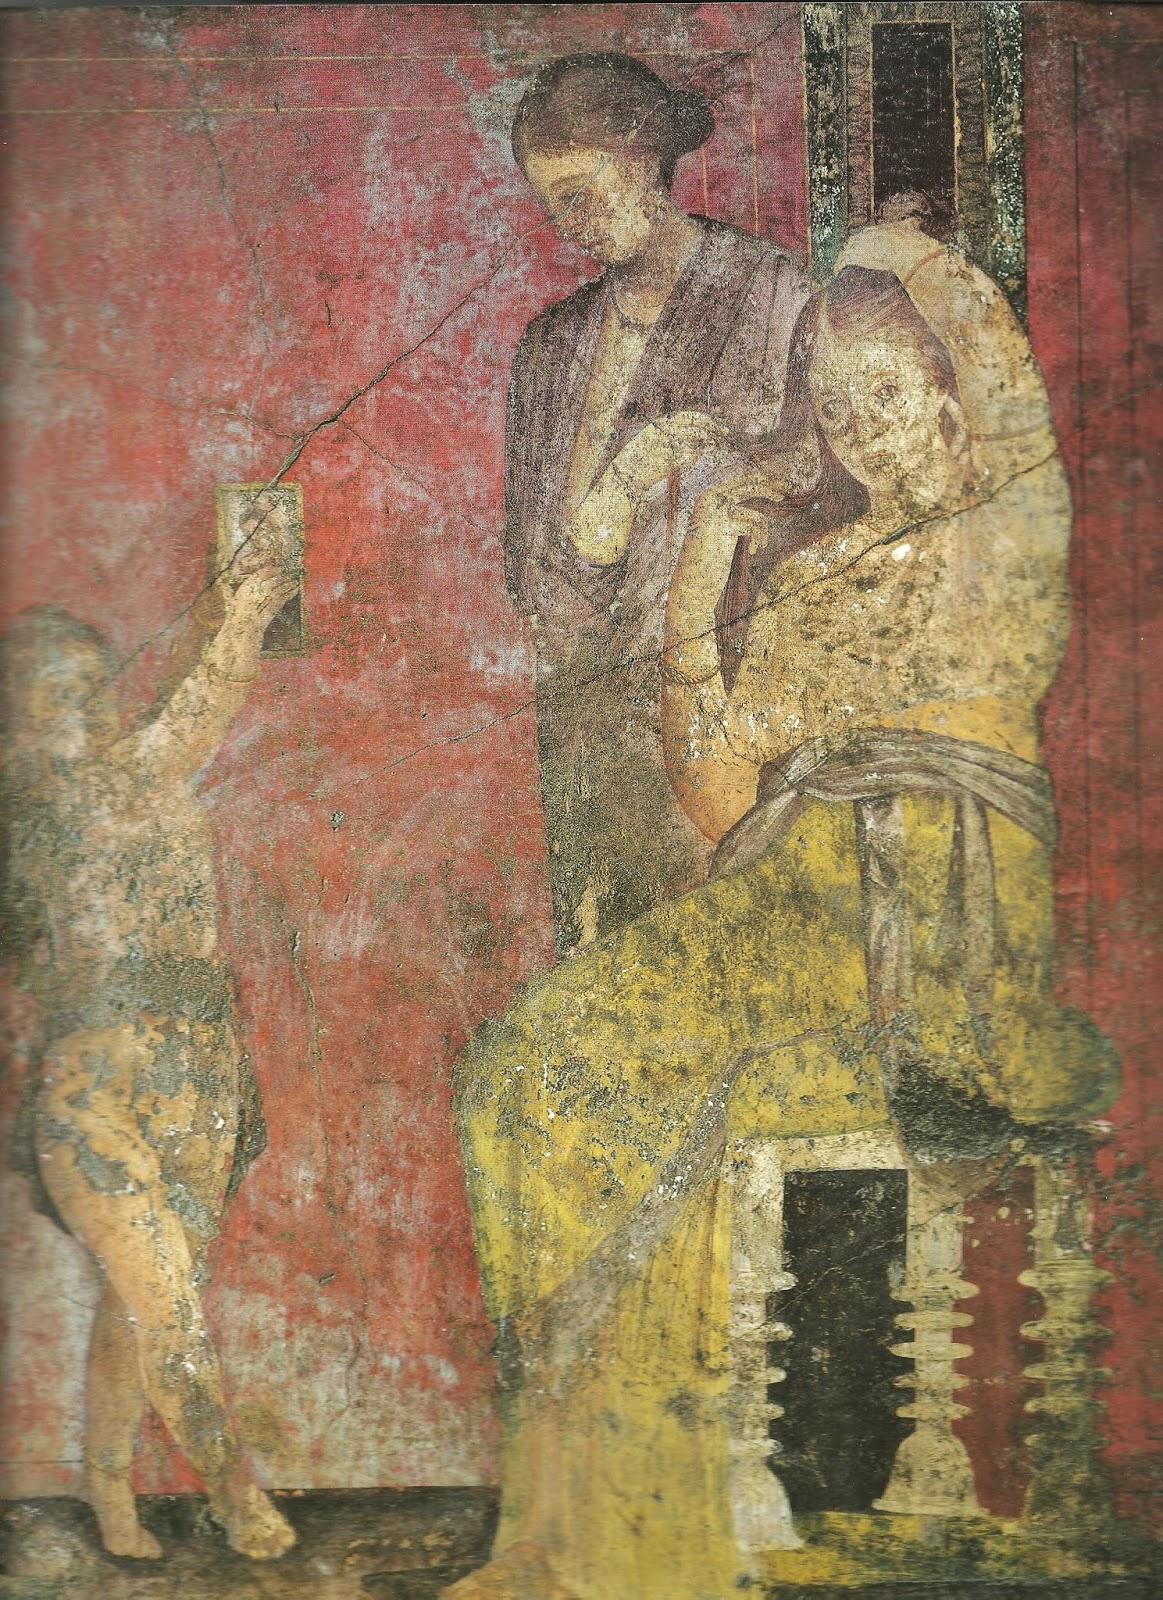 Matrimonio Romano Iustae Nuptiae : Domvs romana nuptiae ritos de una boda